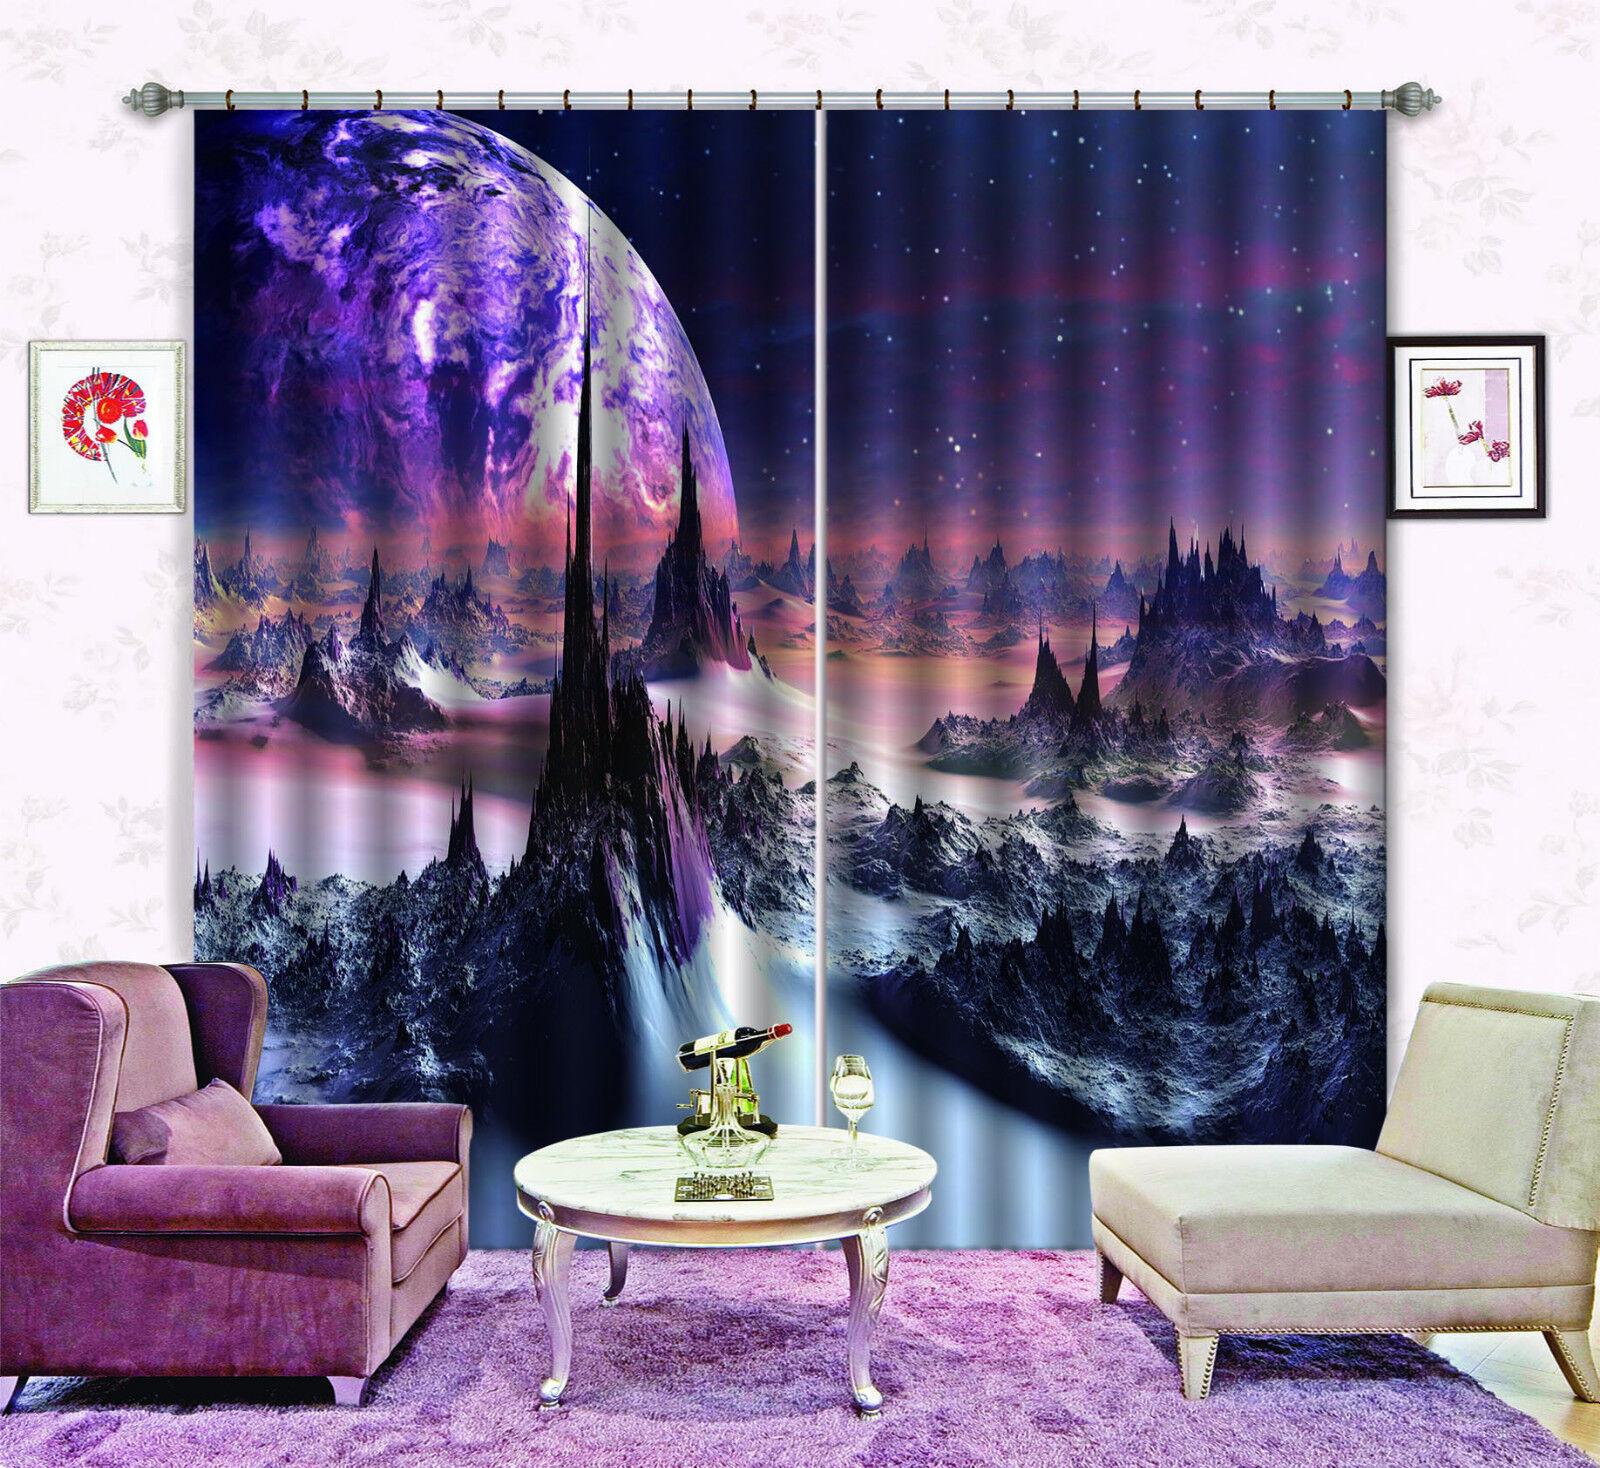 3d extraterrestres 42 bloqueo foto cortina cortina de impresión sustancia cortinas de ventana